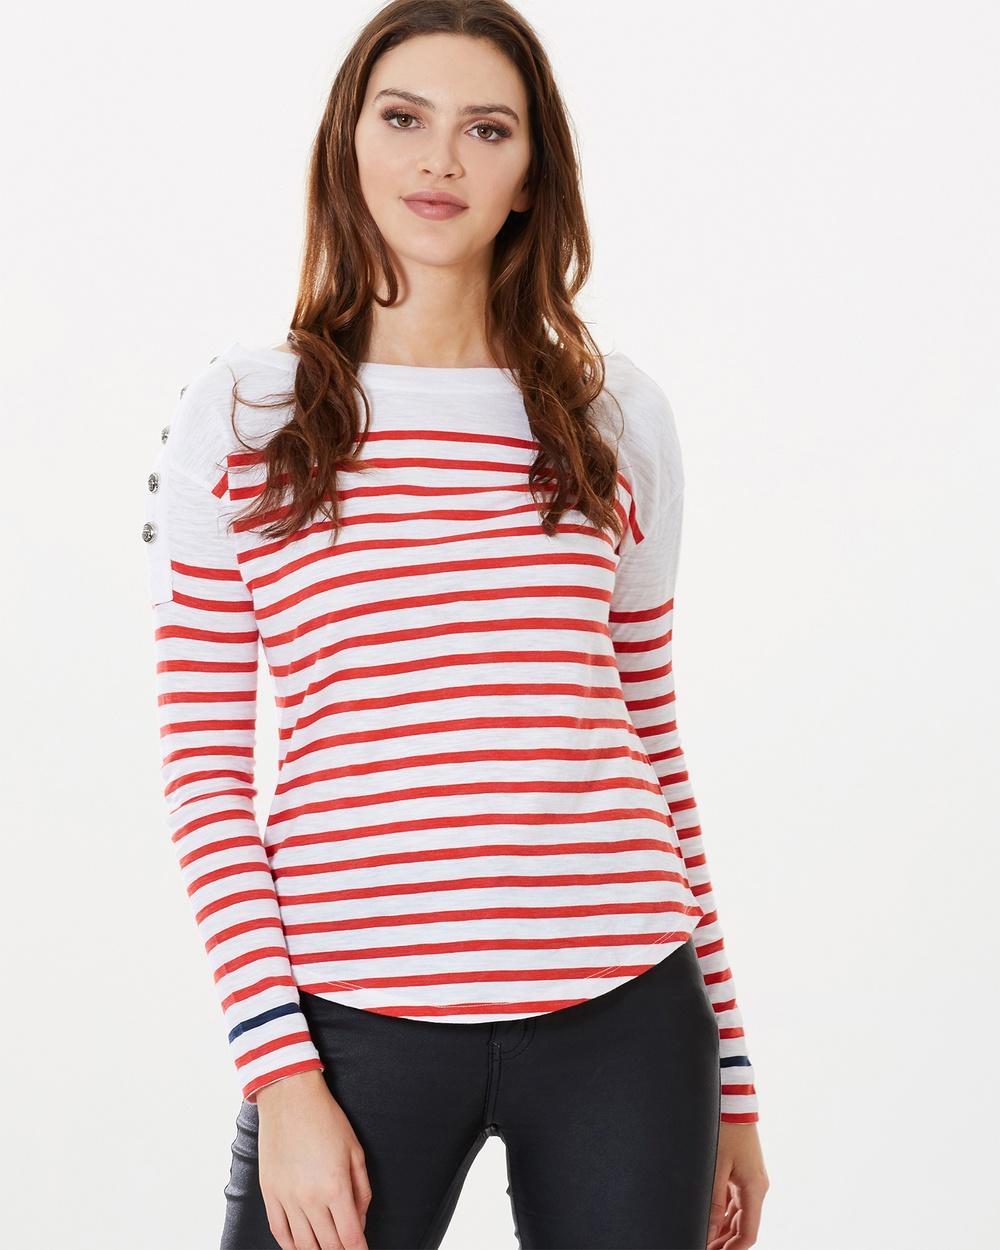 Sophie Moran Nautical Top Tops Red & White Nautical Top